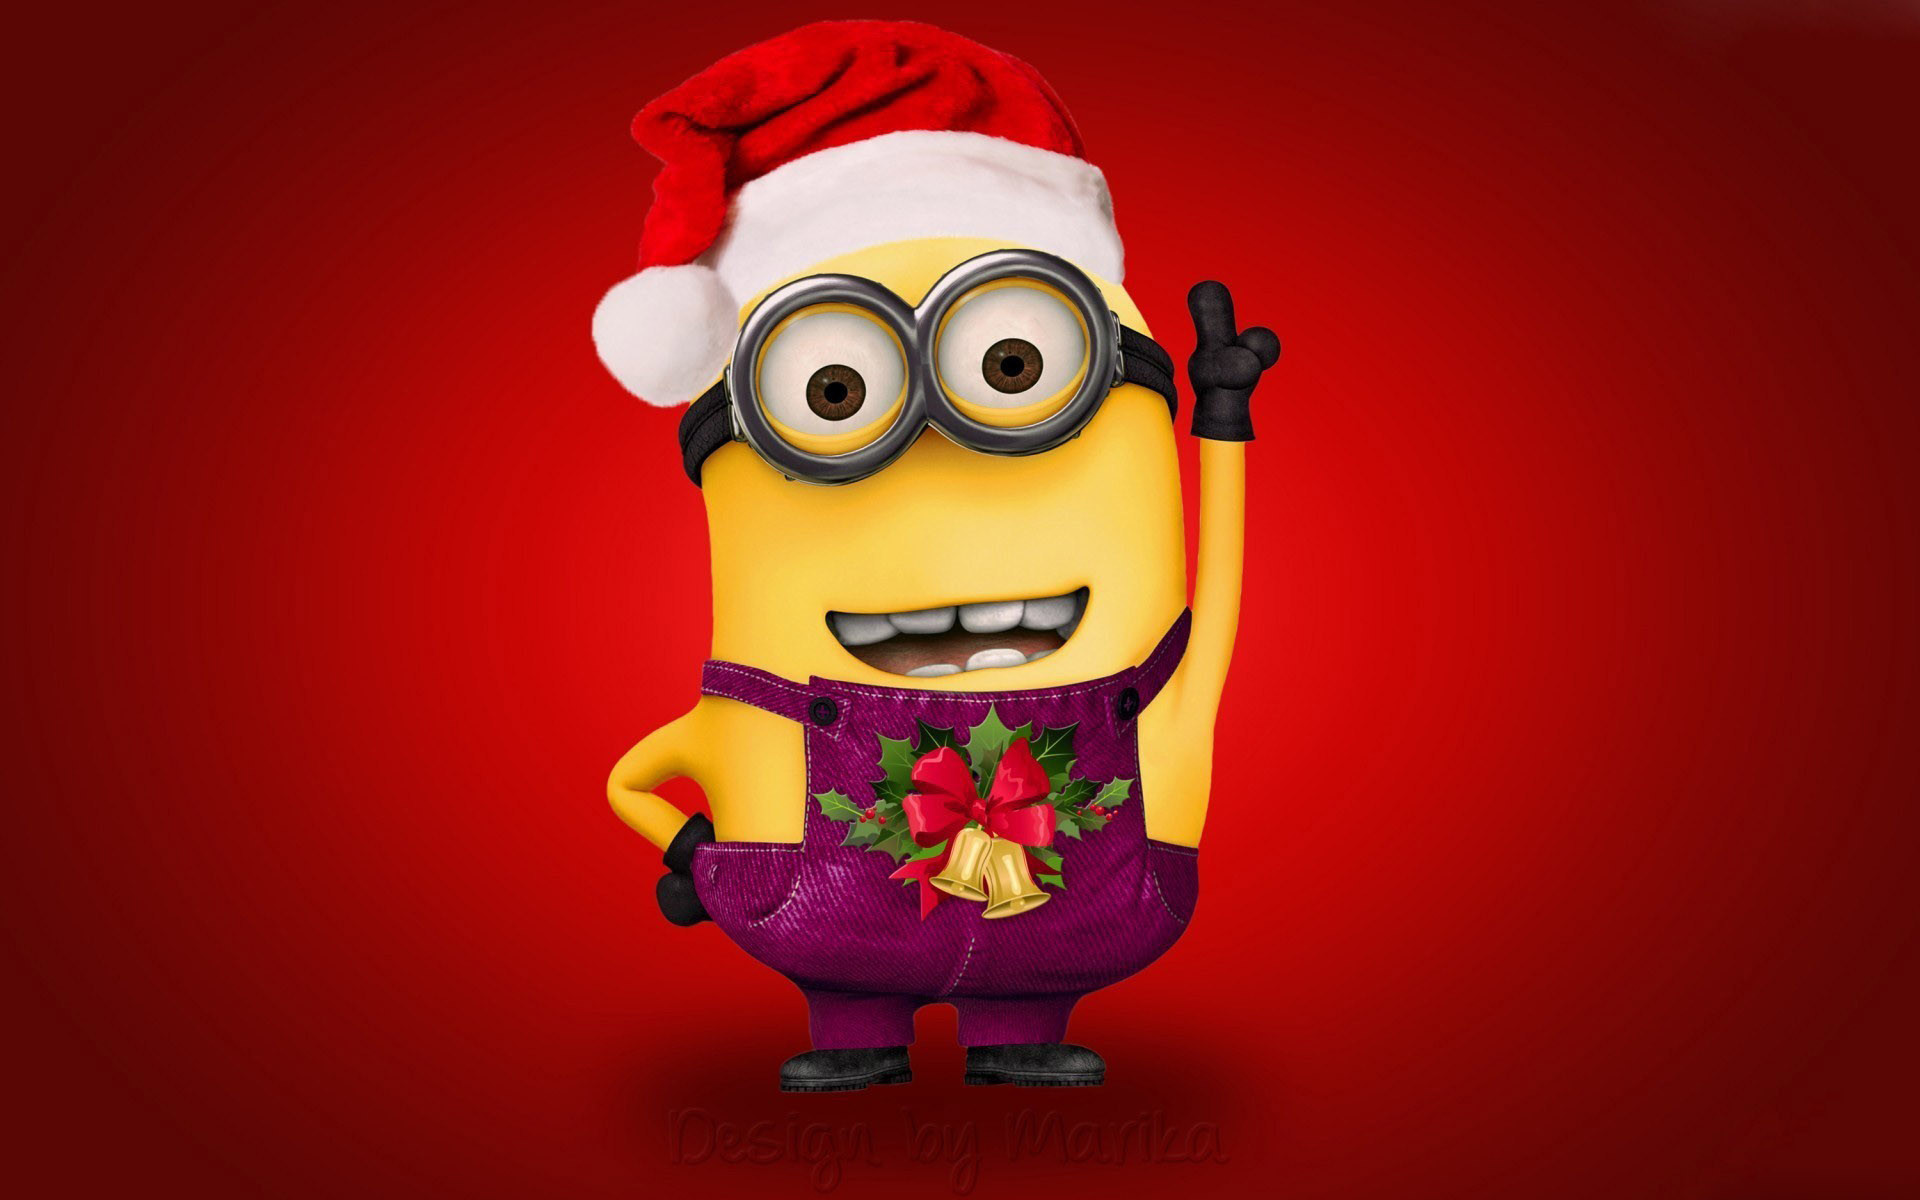 Res: 1920x1200, Minion, Christmas, Wallpaper, Funny, Yellow, Hd, 1920×1200 Wallpaper HD